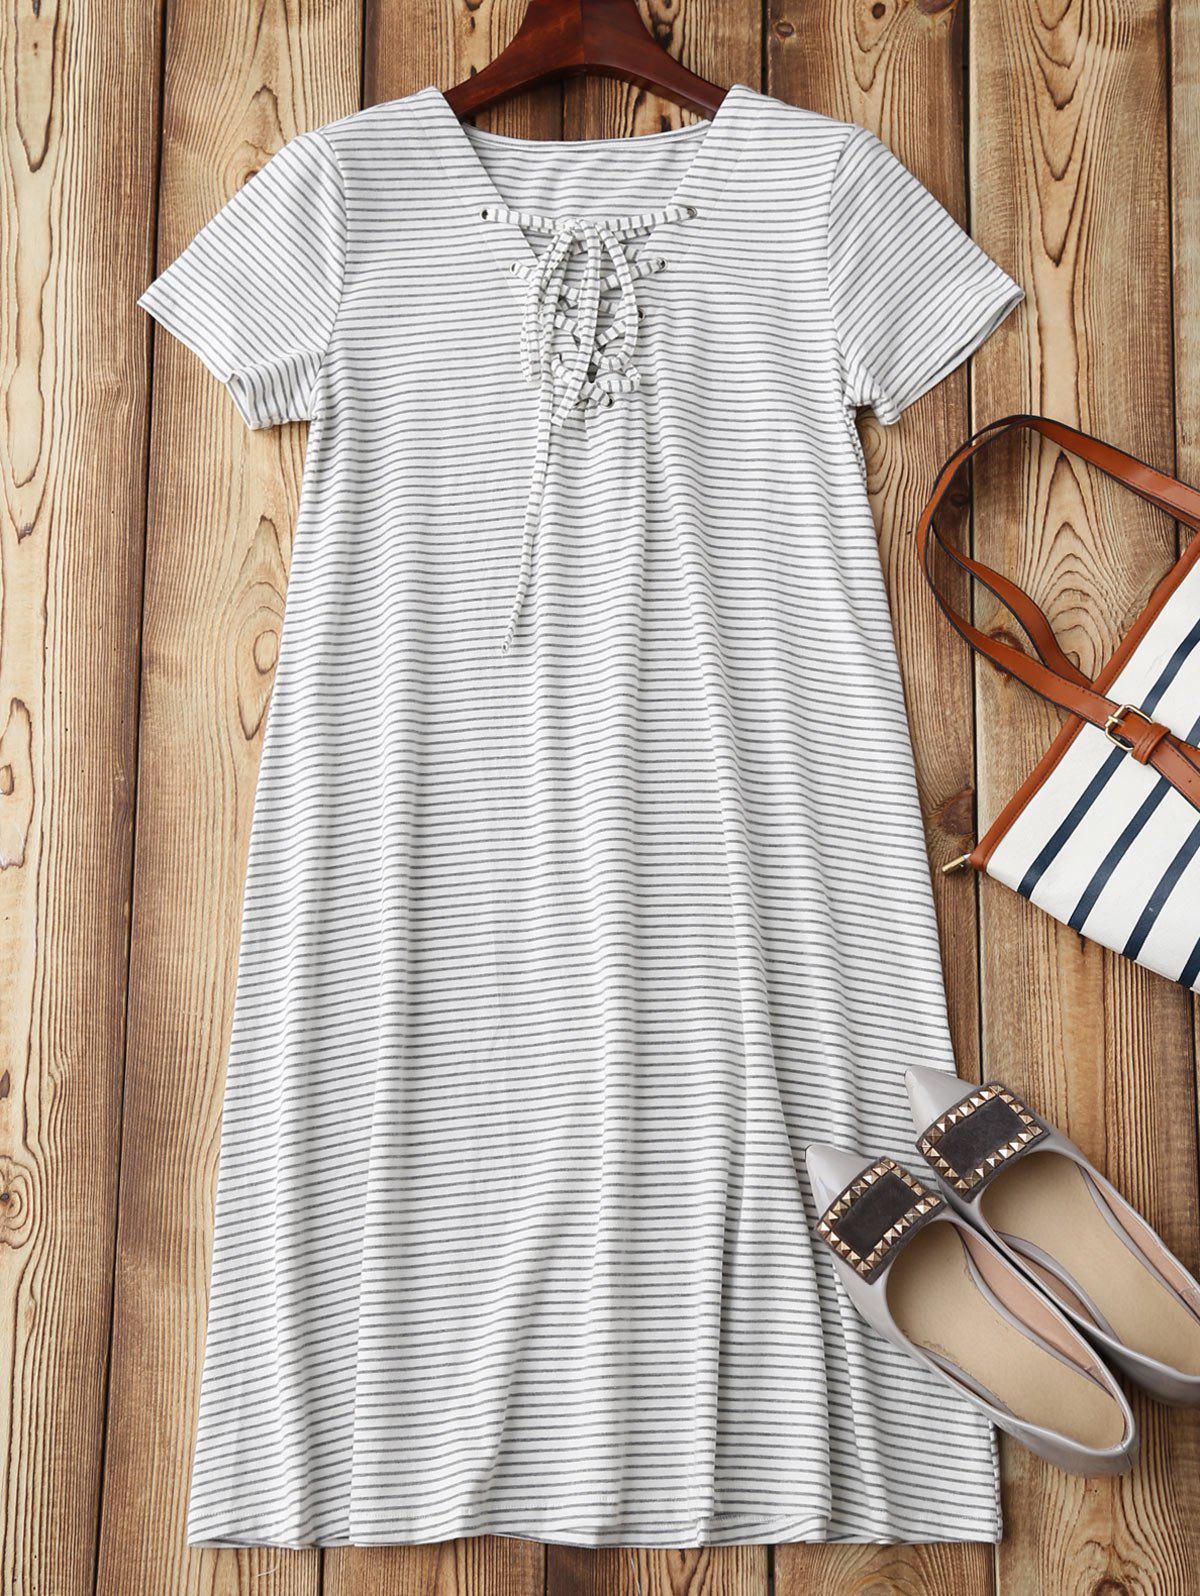 Lace Up Striped Loungewear